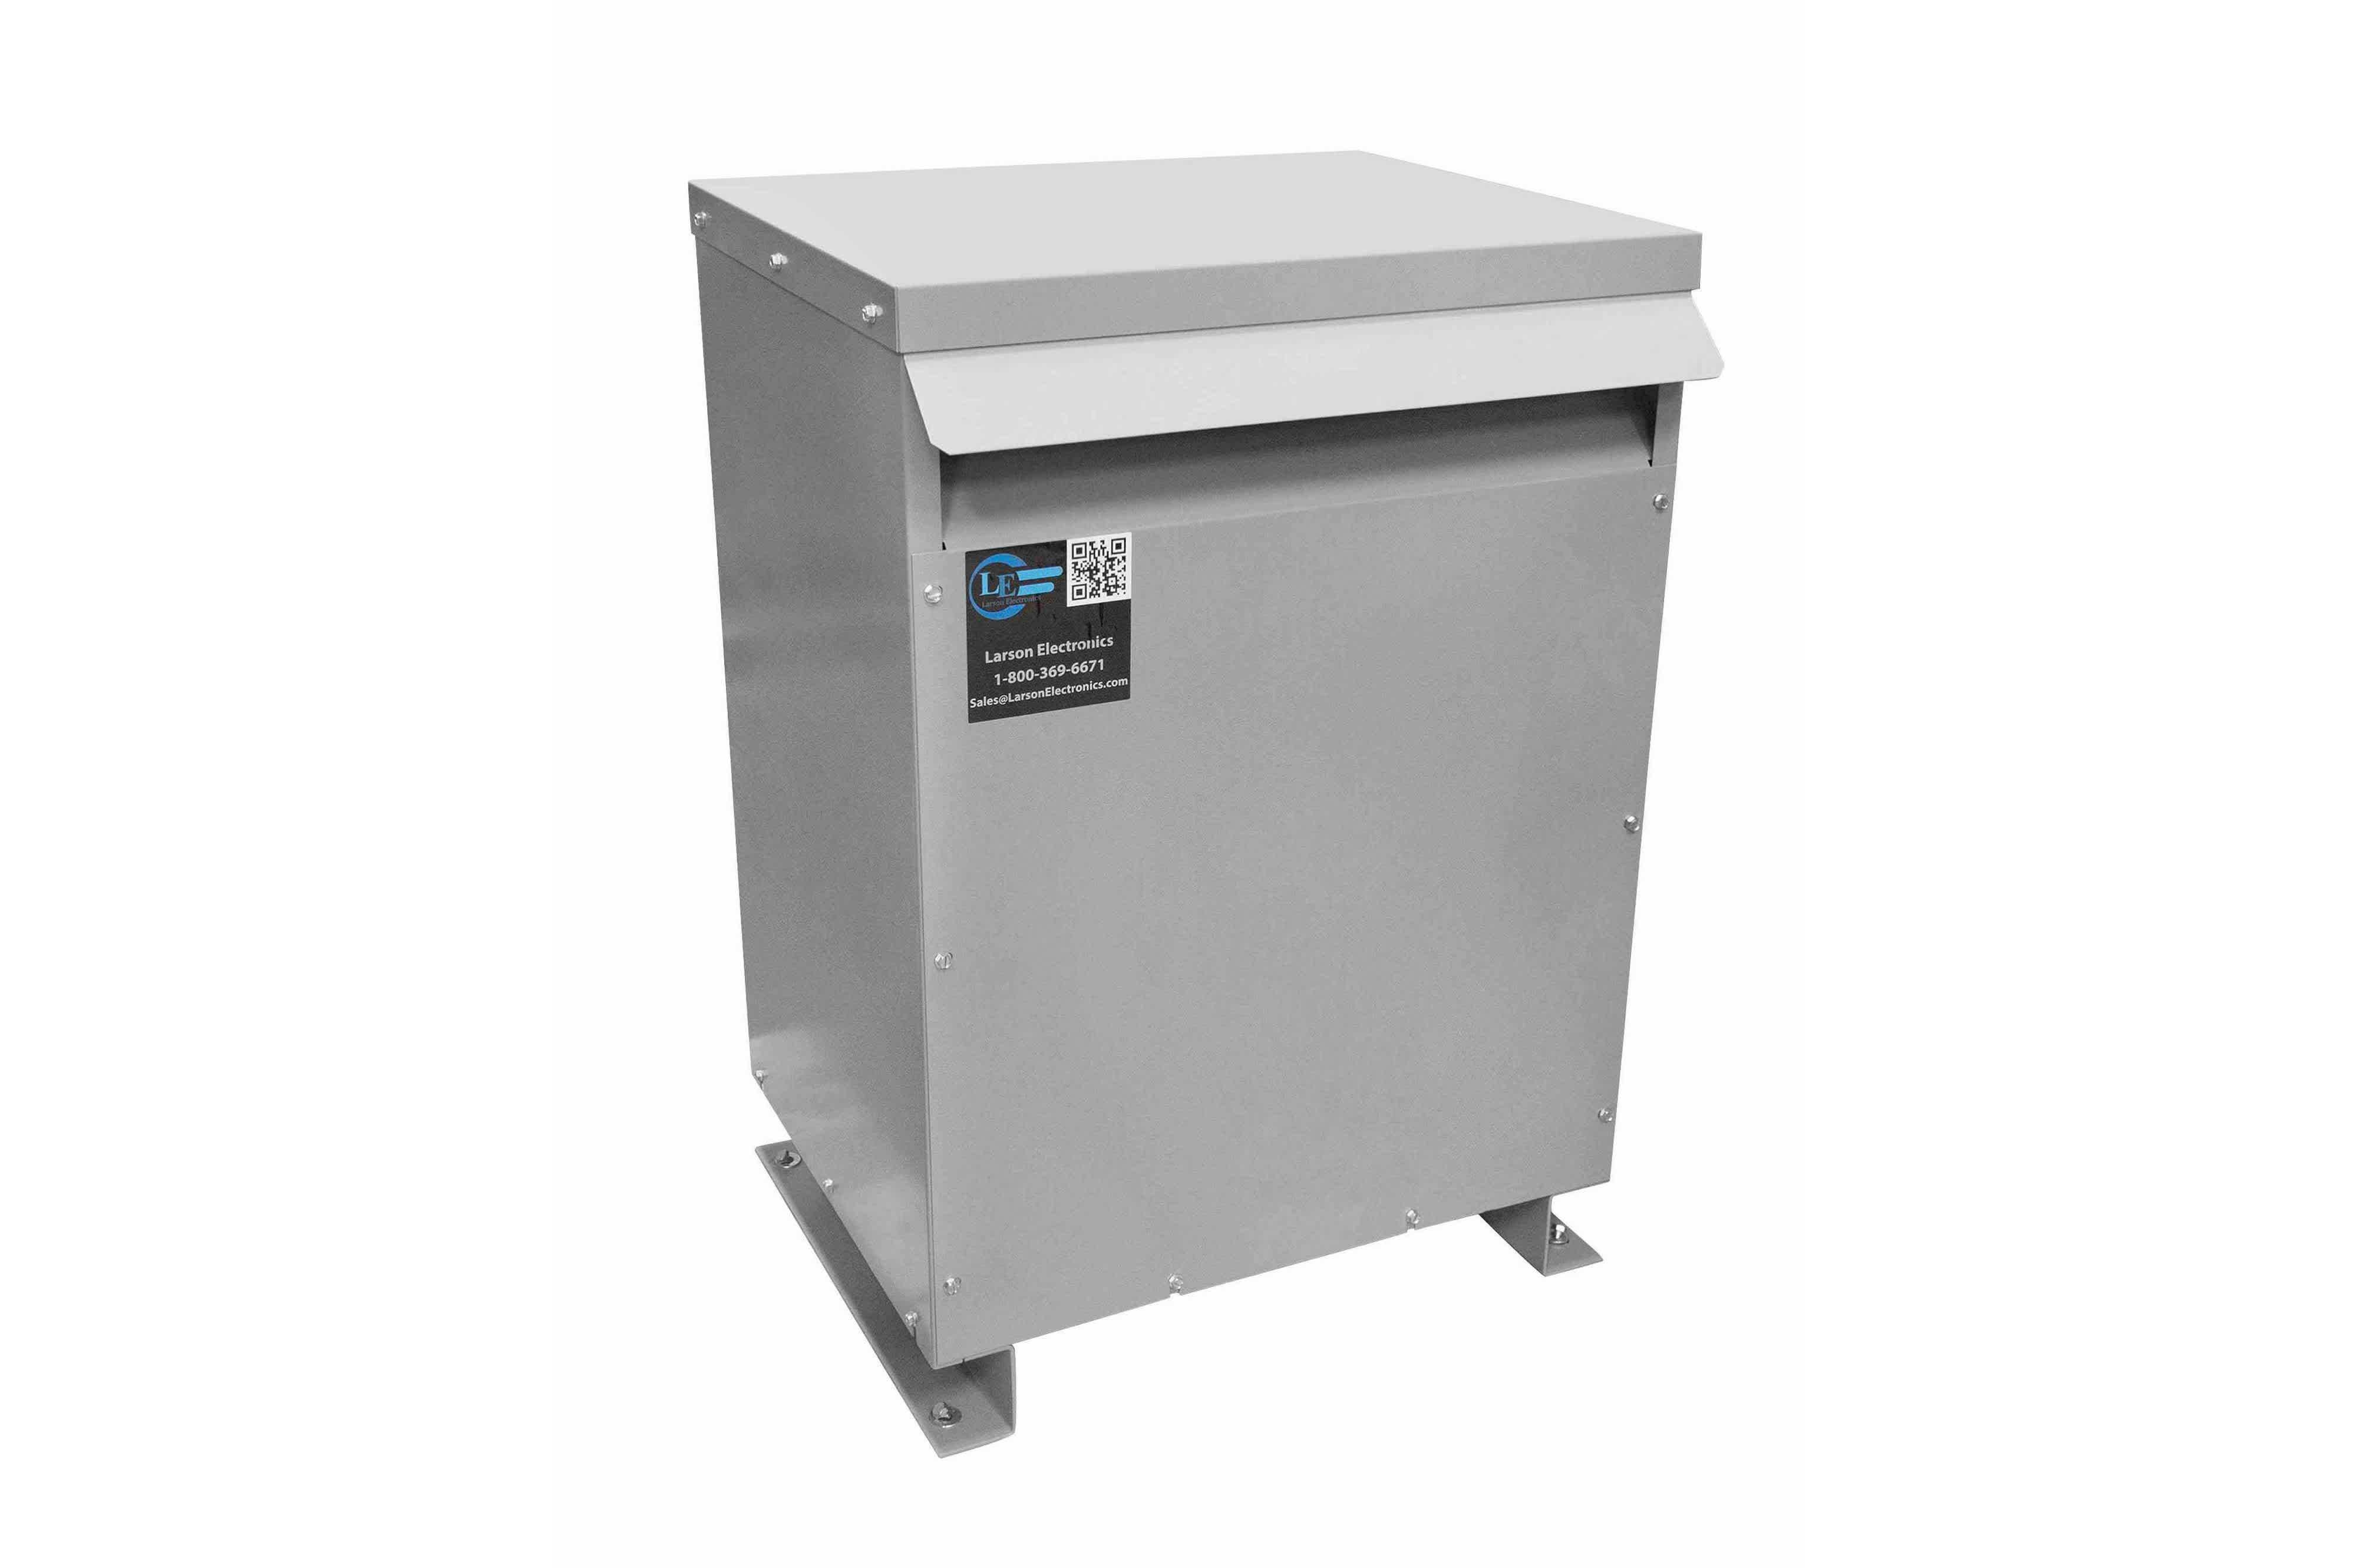 400 kVA 3PH DOE Transformer, 230V Delta Primary, 480Y/277 Wye-N Secondary, N3R, Ventilated, 60 Hz